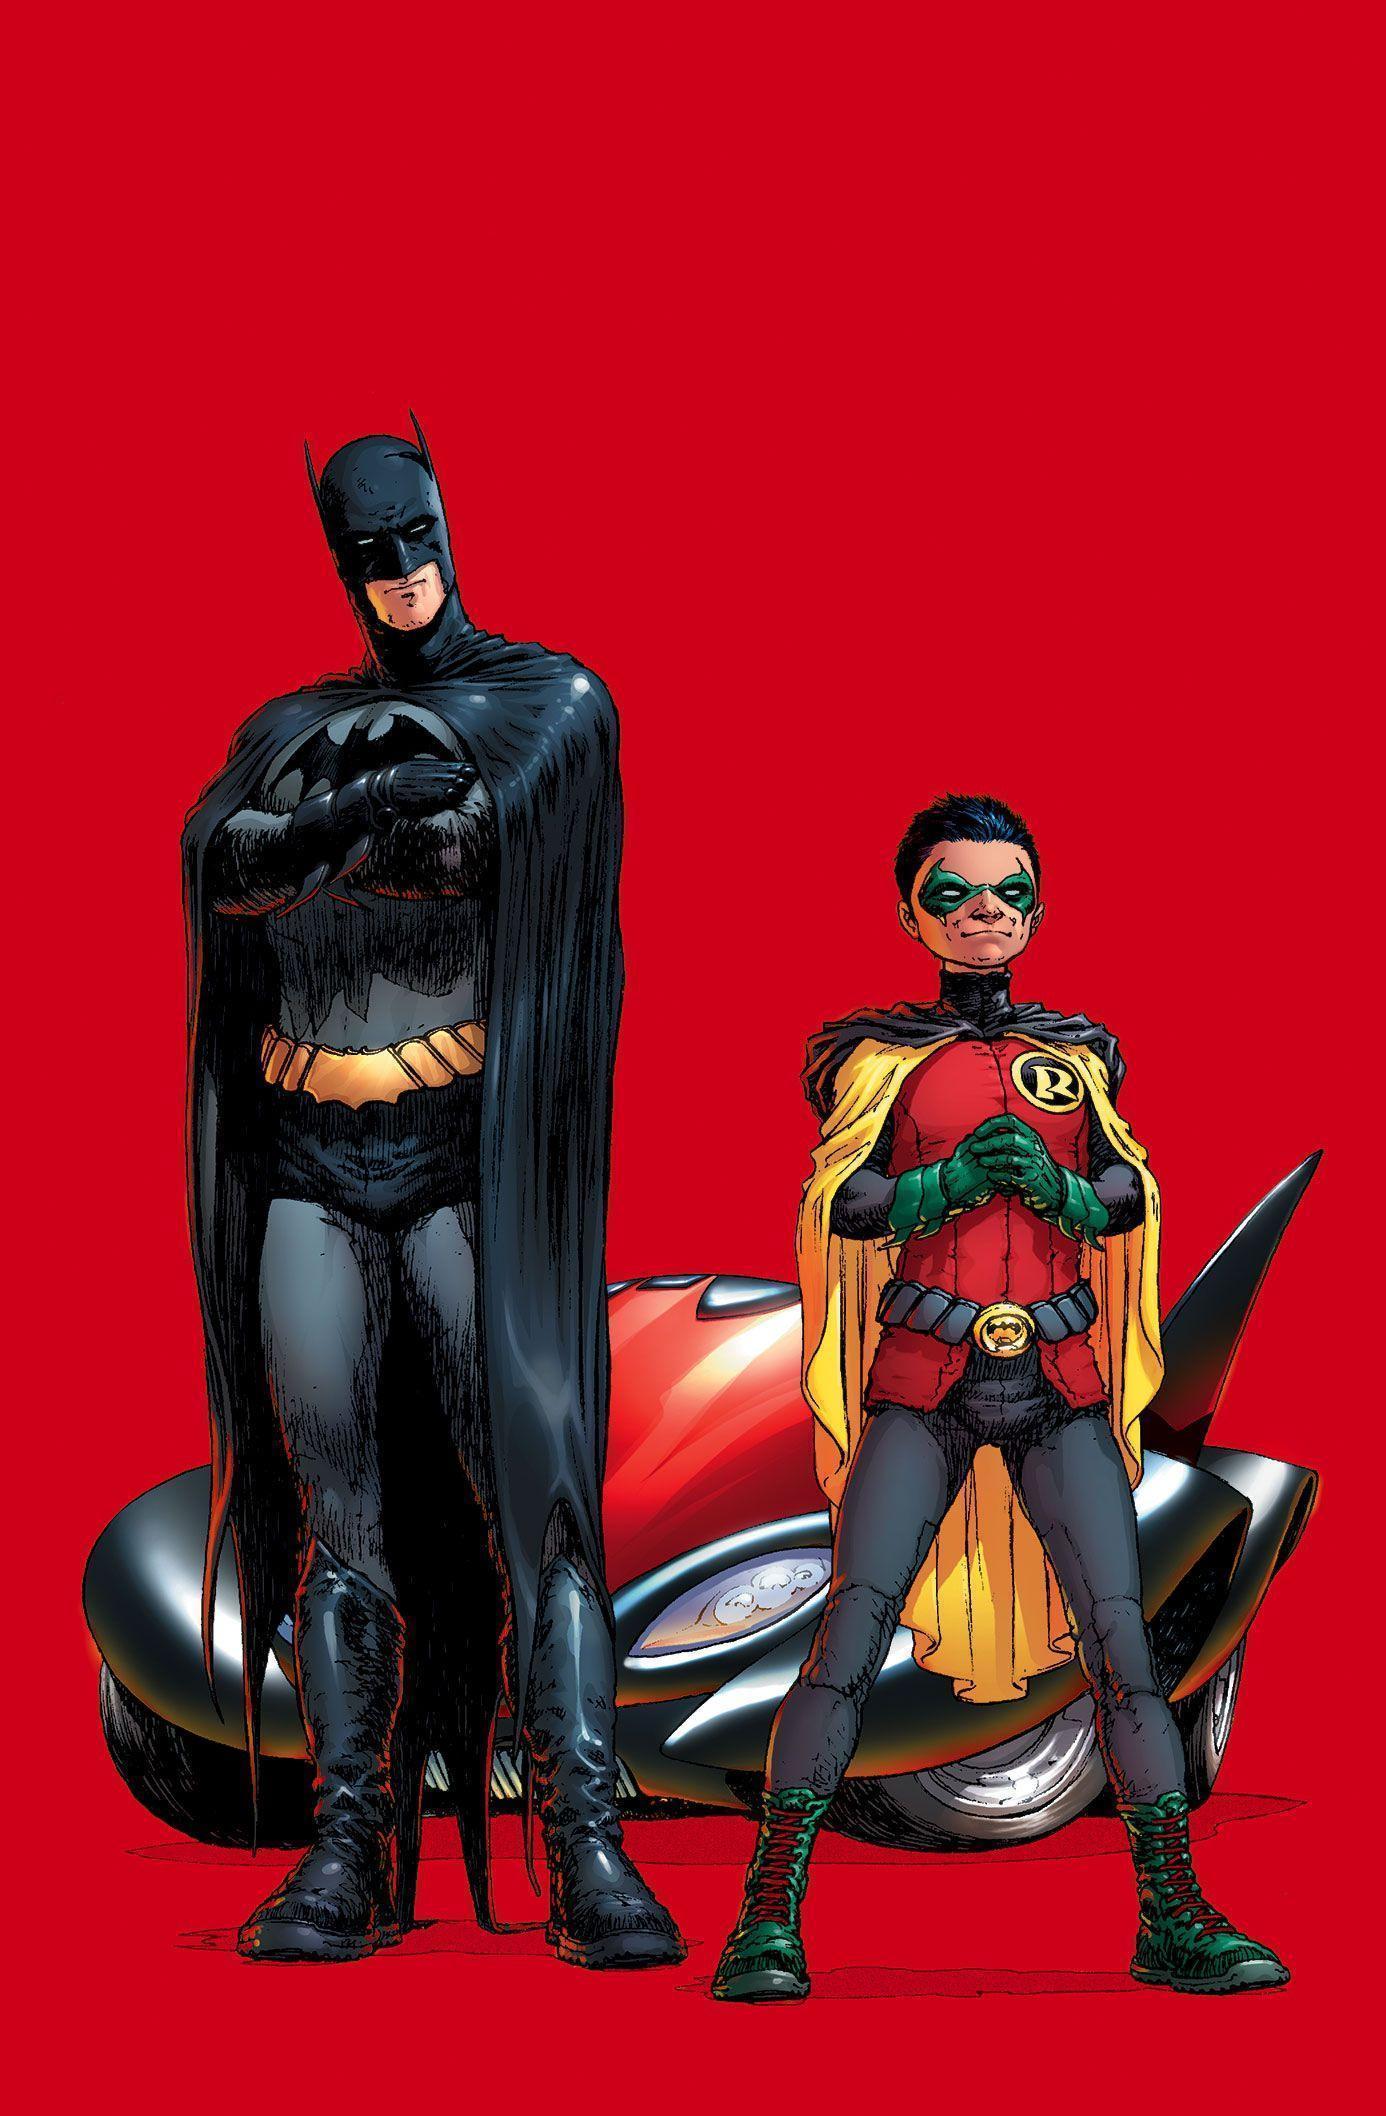 HD Batman And Robin Wallpapers and Photos | HD Comics Wallpapers